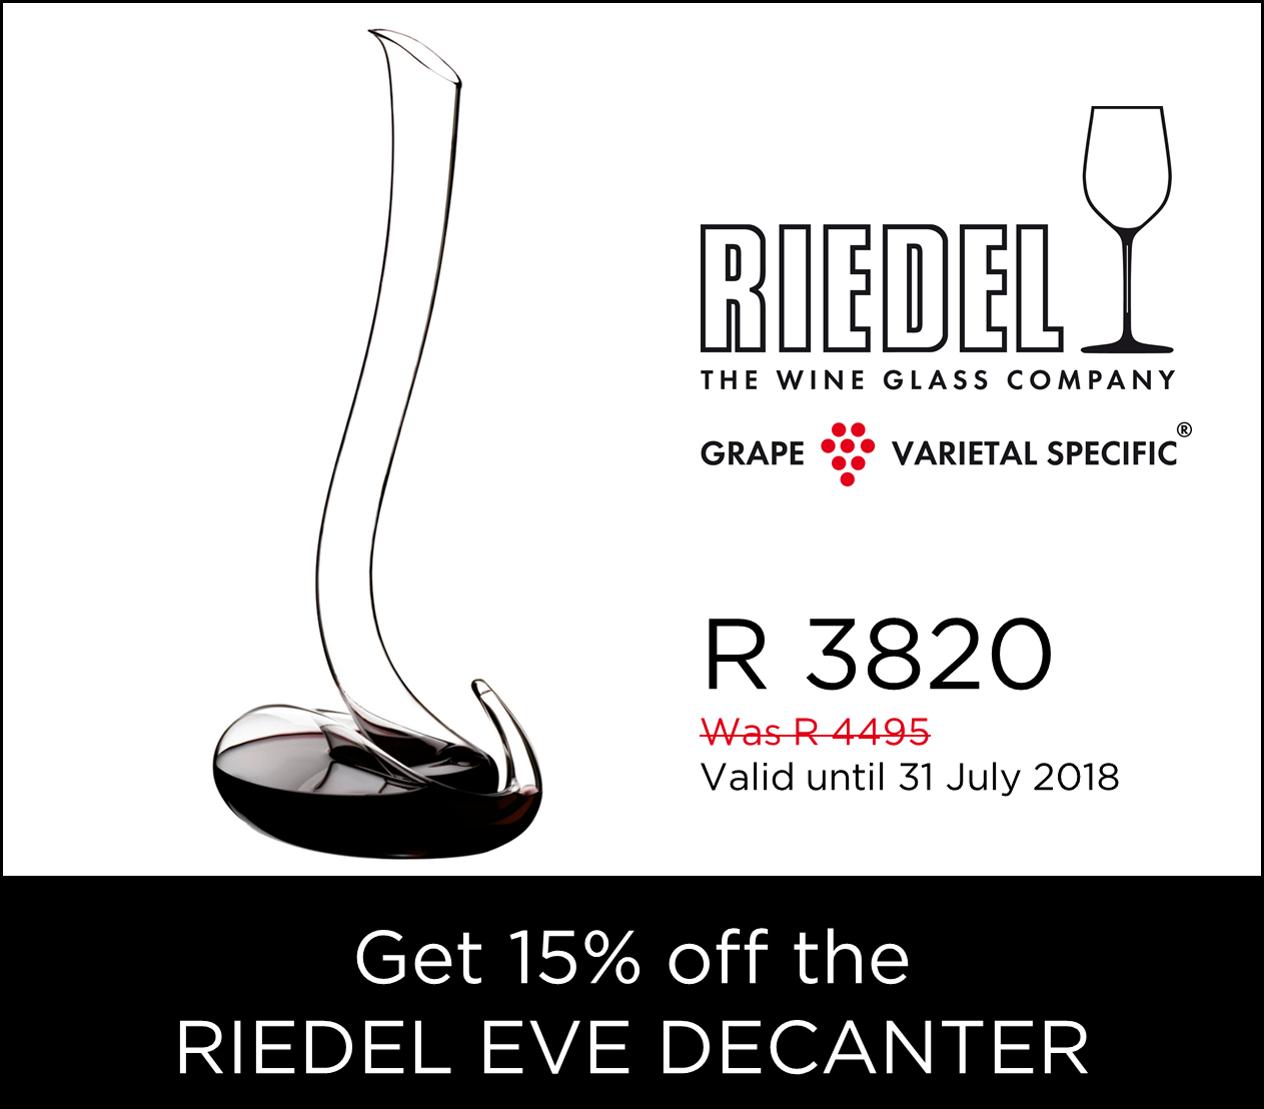 Riedel Eve Decanter promo